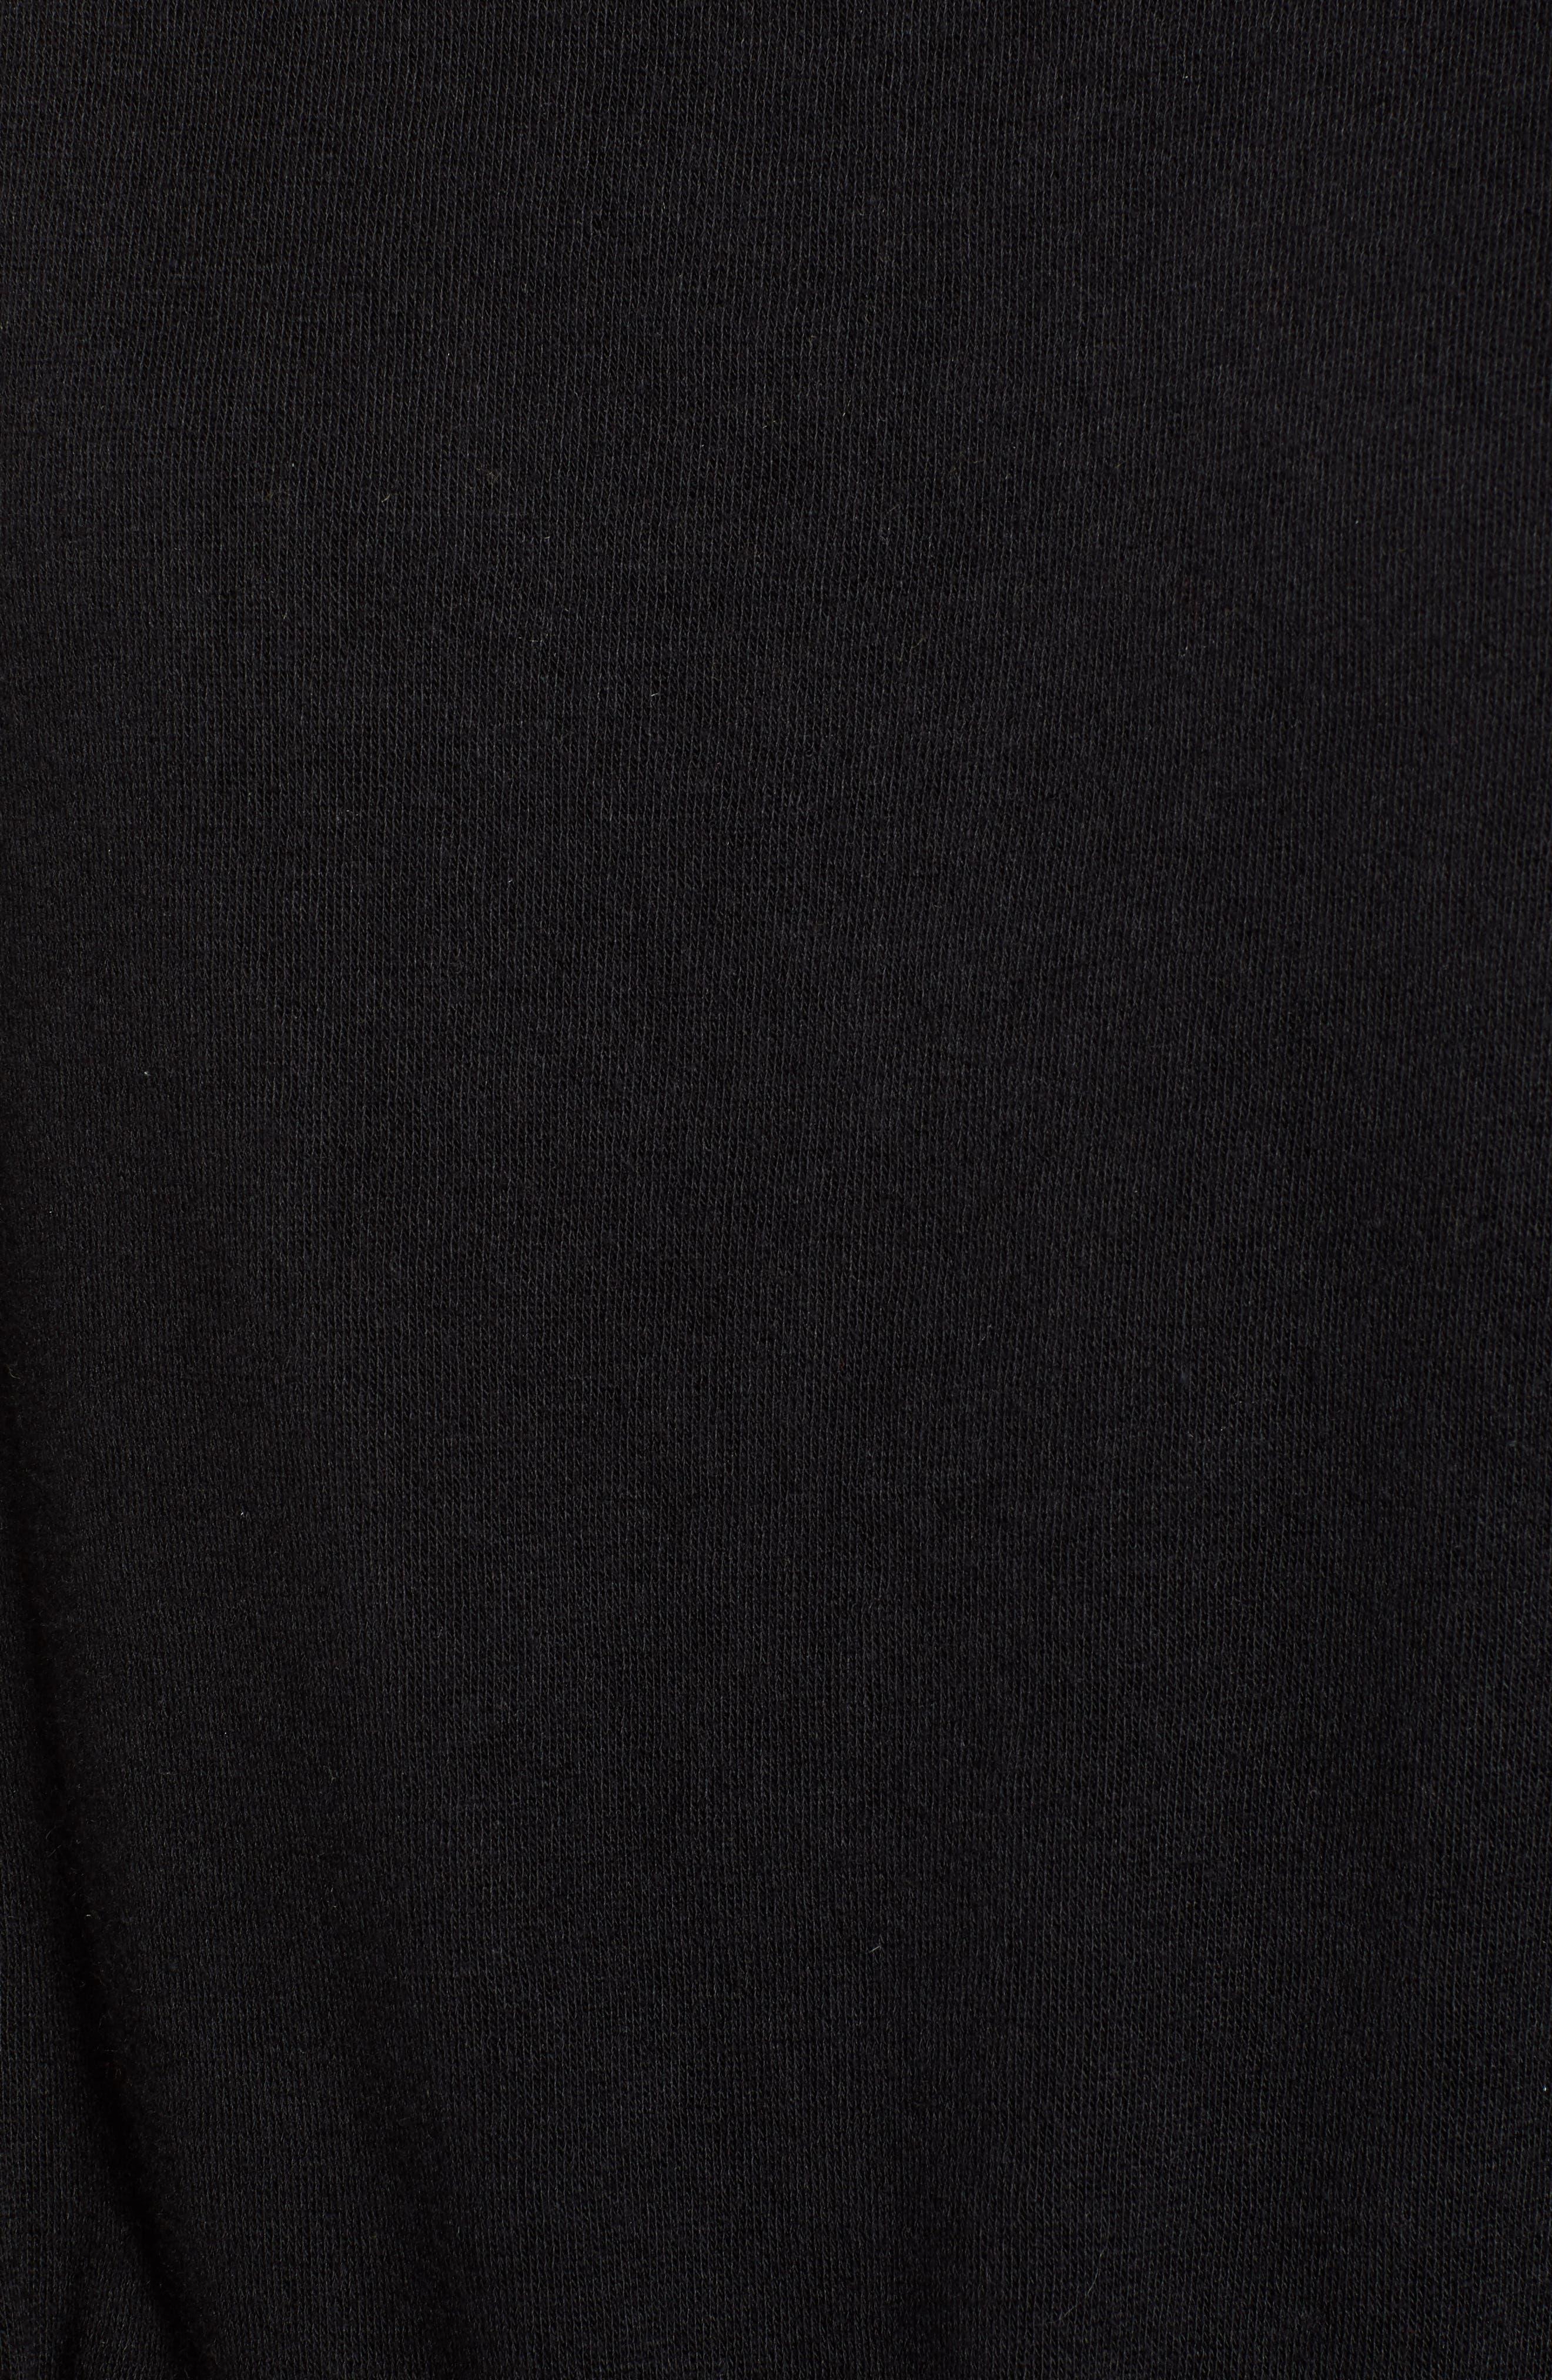 Belted Sweatshirt Dress,                             Alternate thumbnail 6, color,                             BLACK